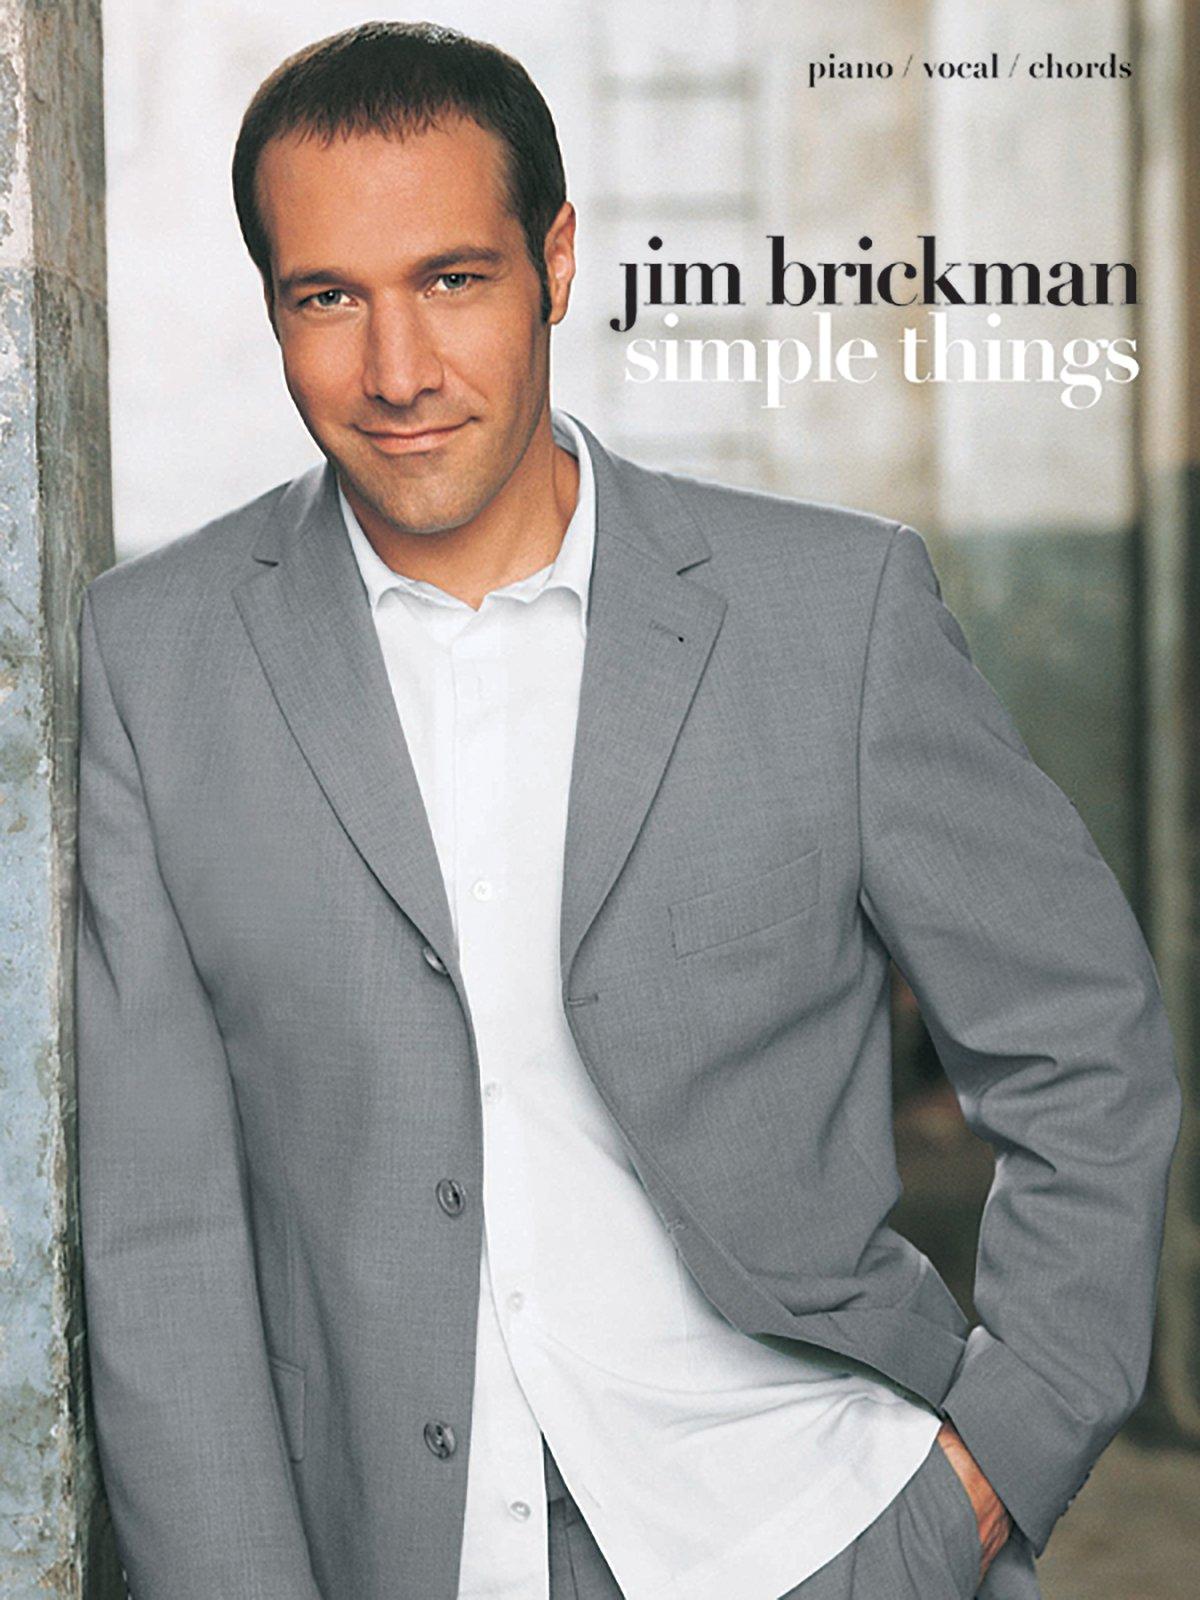 Jim Brickman -- Simple Things: Piano/Vocal/Chords